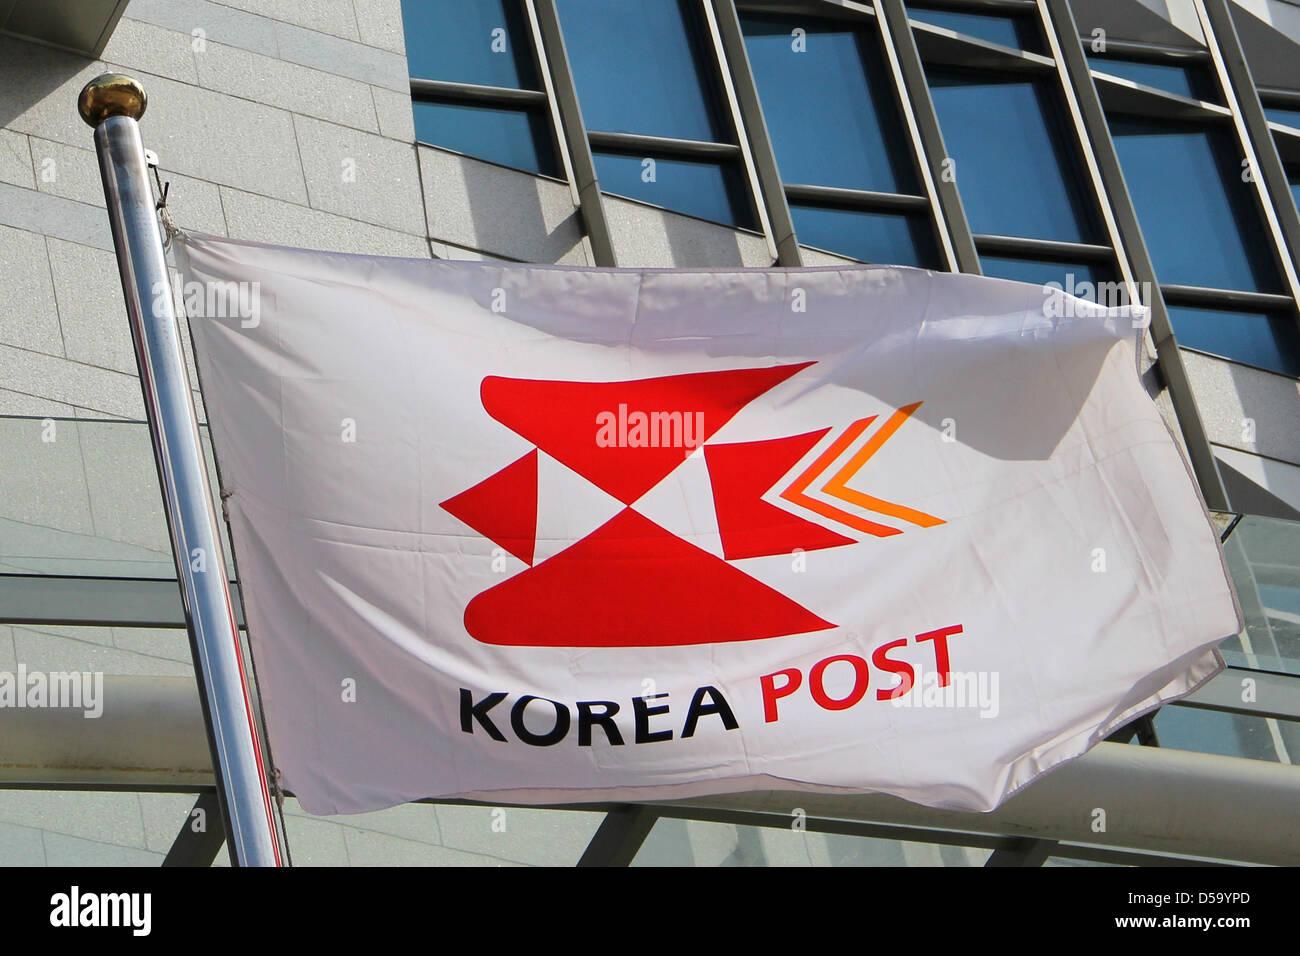 South Korea: Korea Post headquarters (Post Tower) in Seoul Stock Photo